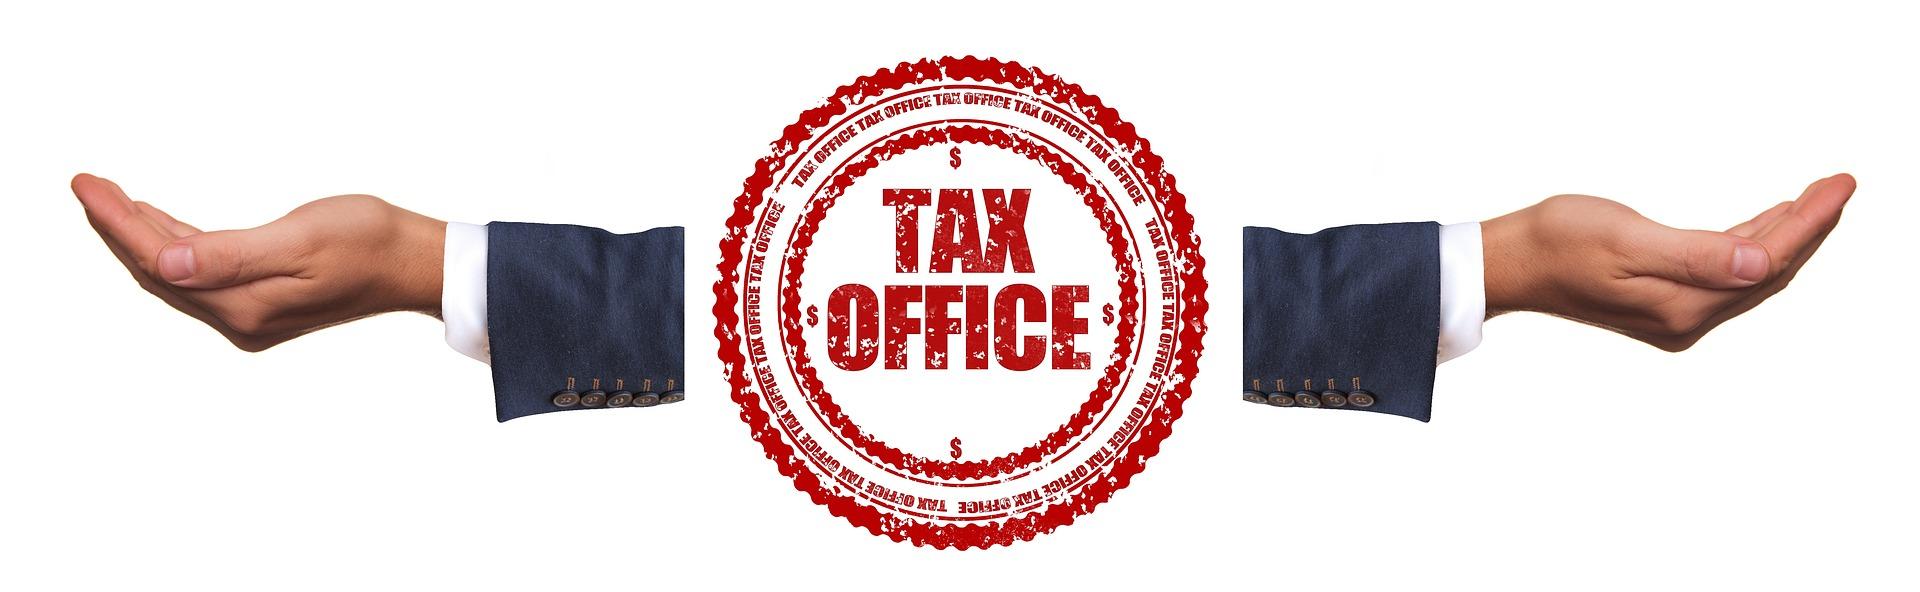 tax-office-2668797_1920